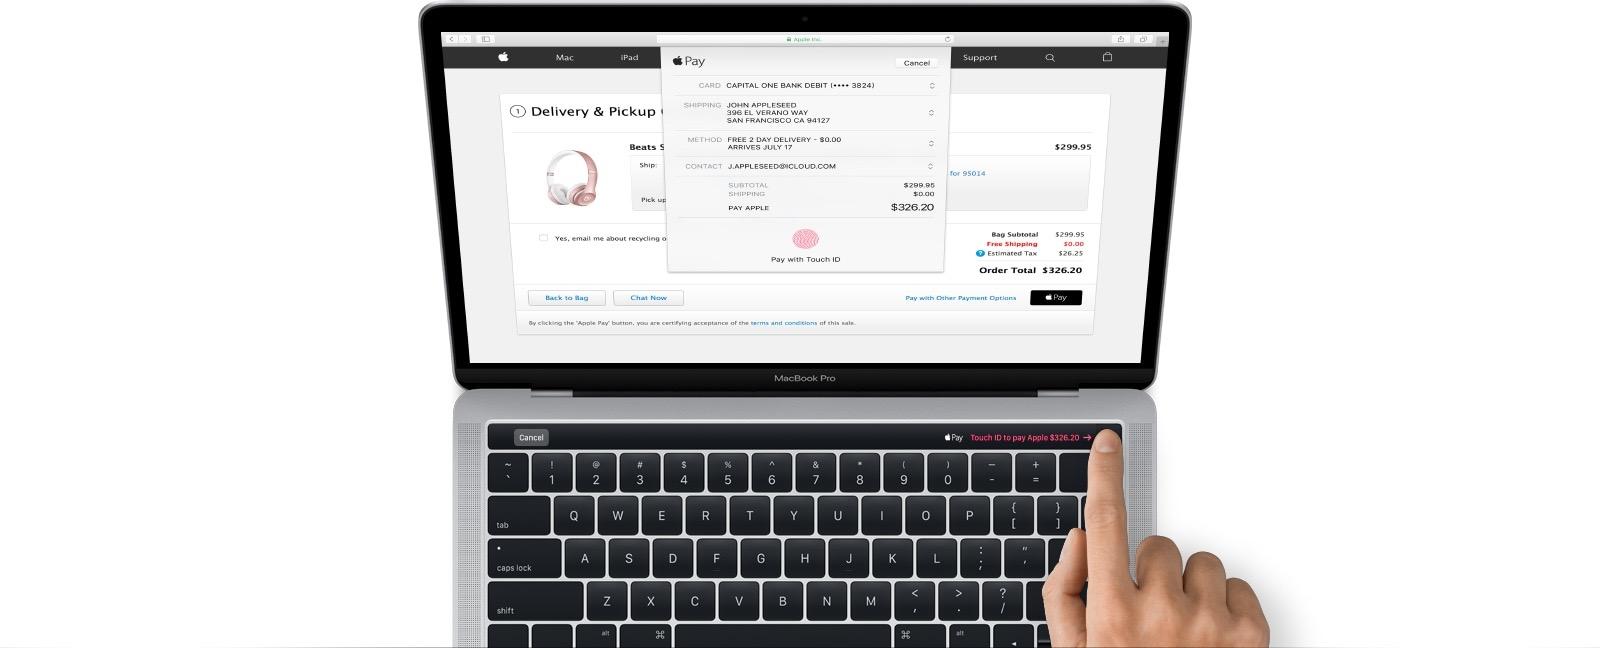 Magic Toolbar do novo MacBook Pro